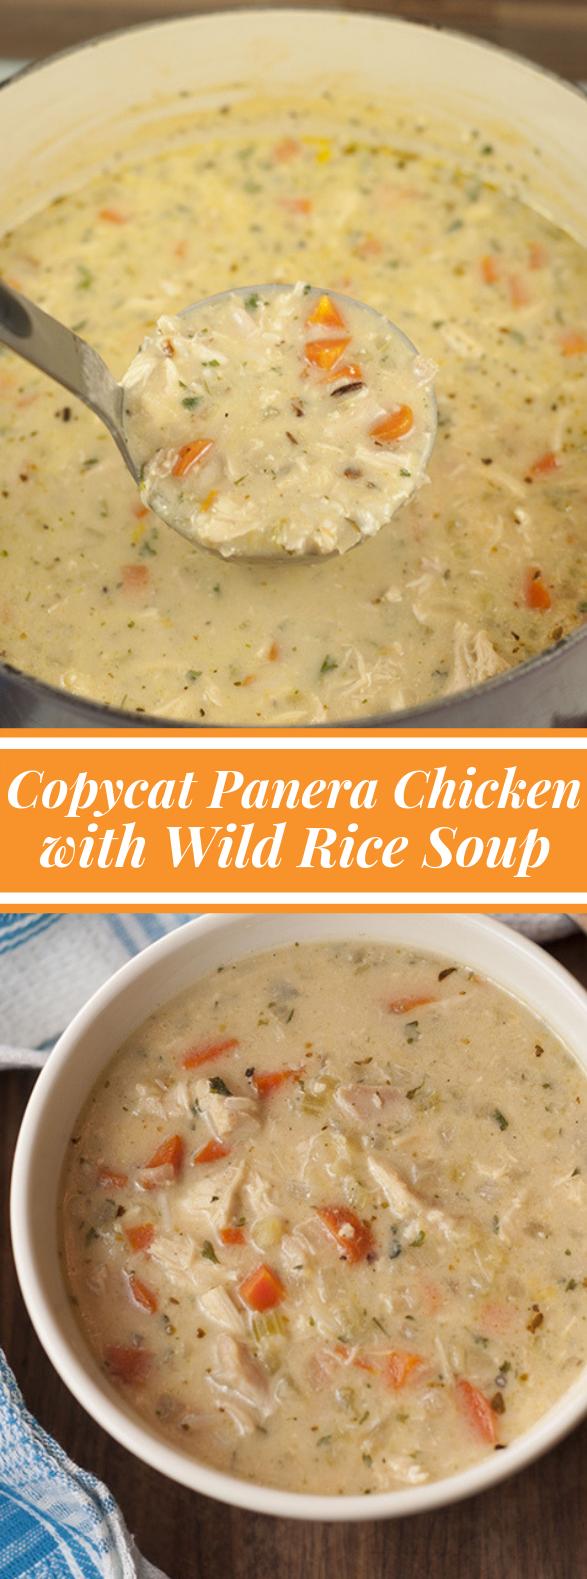 Copycat Panera Chicken & Wild Rice Soup #dinner #maindish